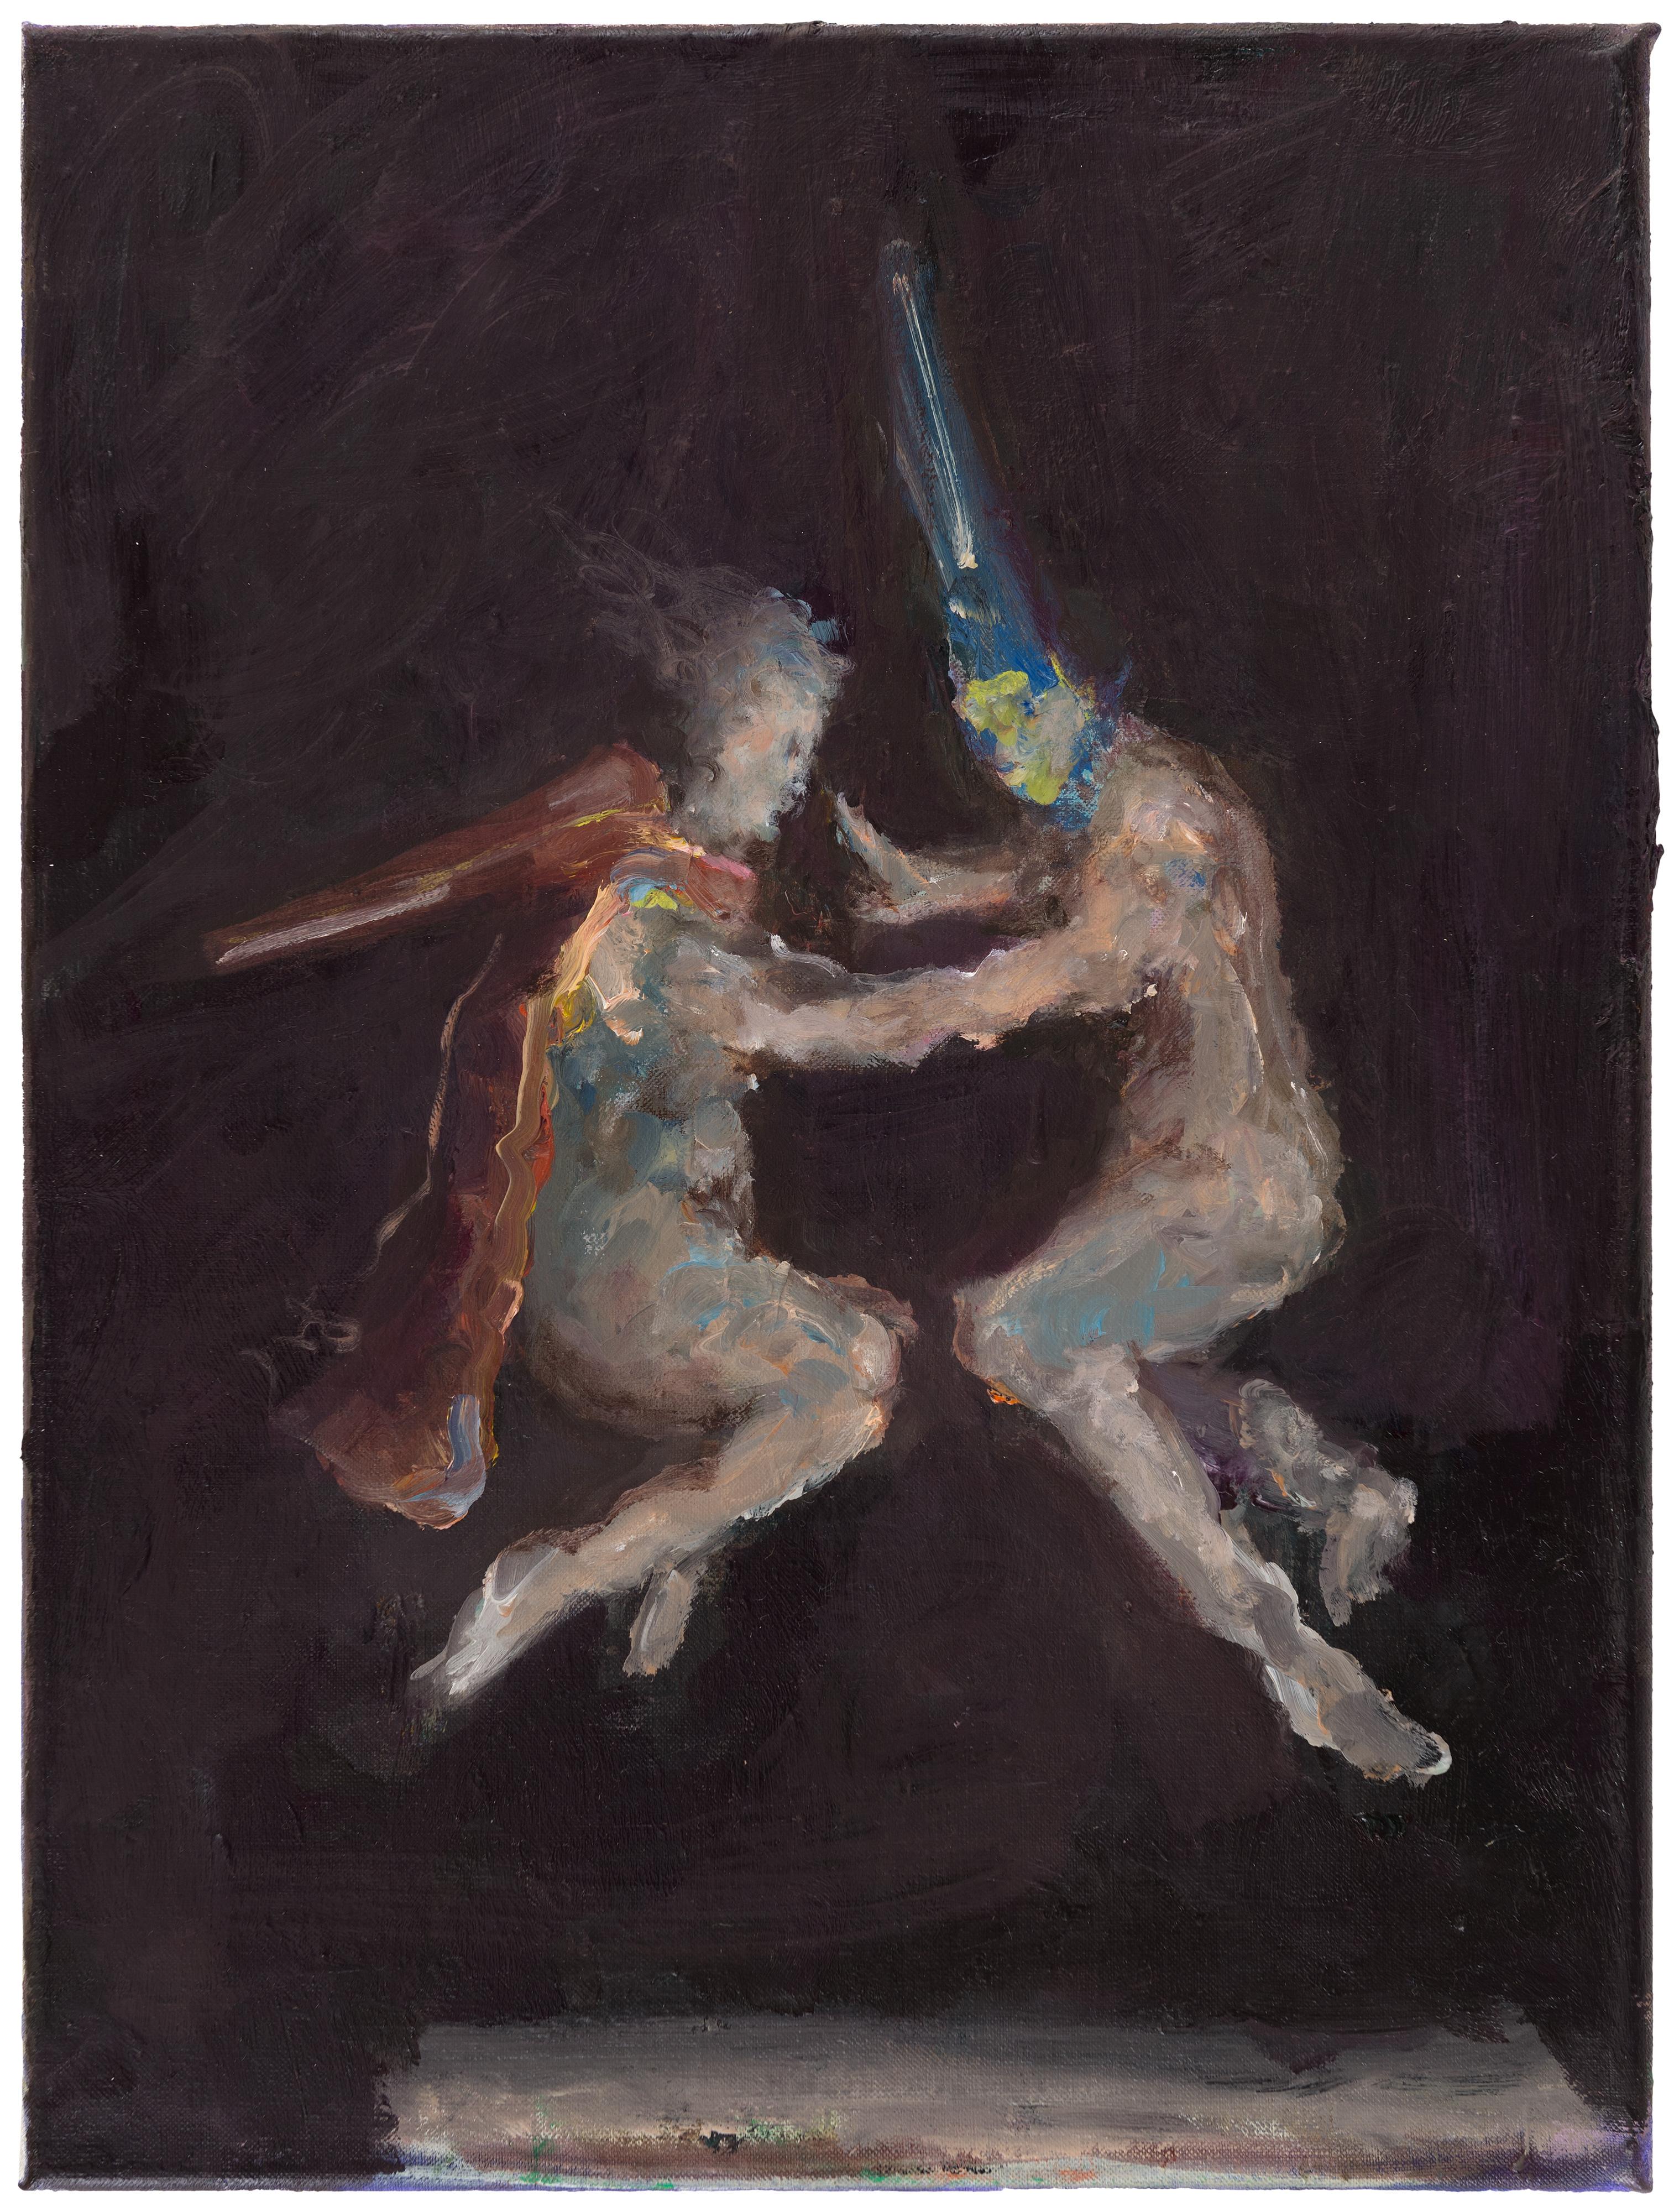 Galerie Barbara Thumm \ Valérie Favre: Ghost (nach Goyas Flug der Hexen) (VFa-15-012) \ Ghost (nach Goyas Flug der Hexen) (2015)